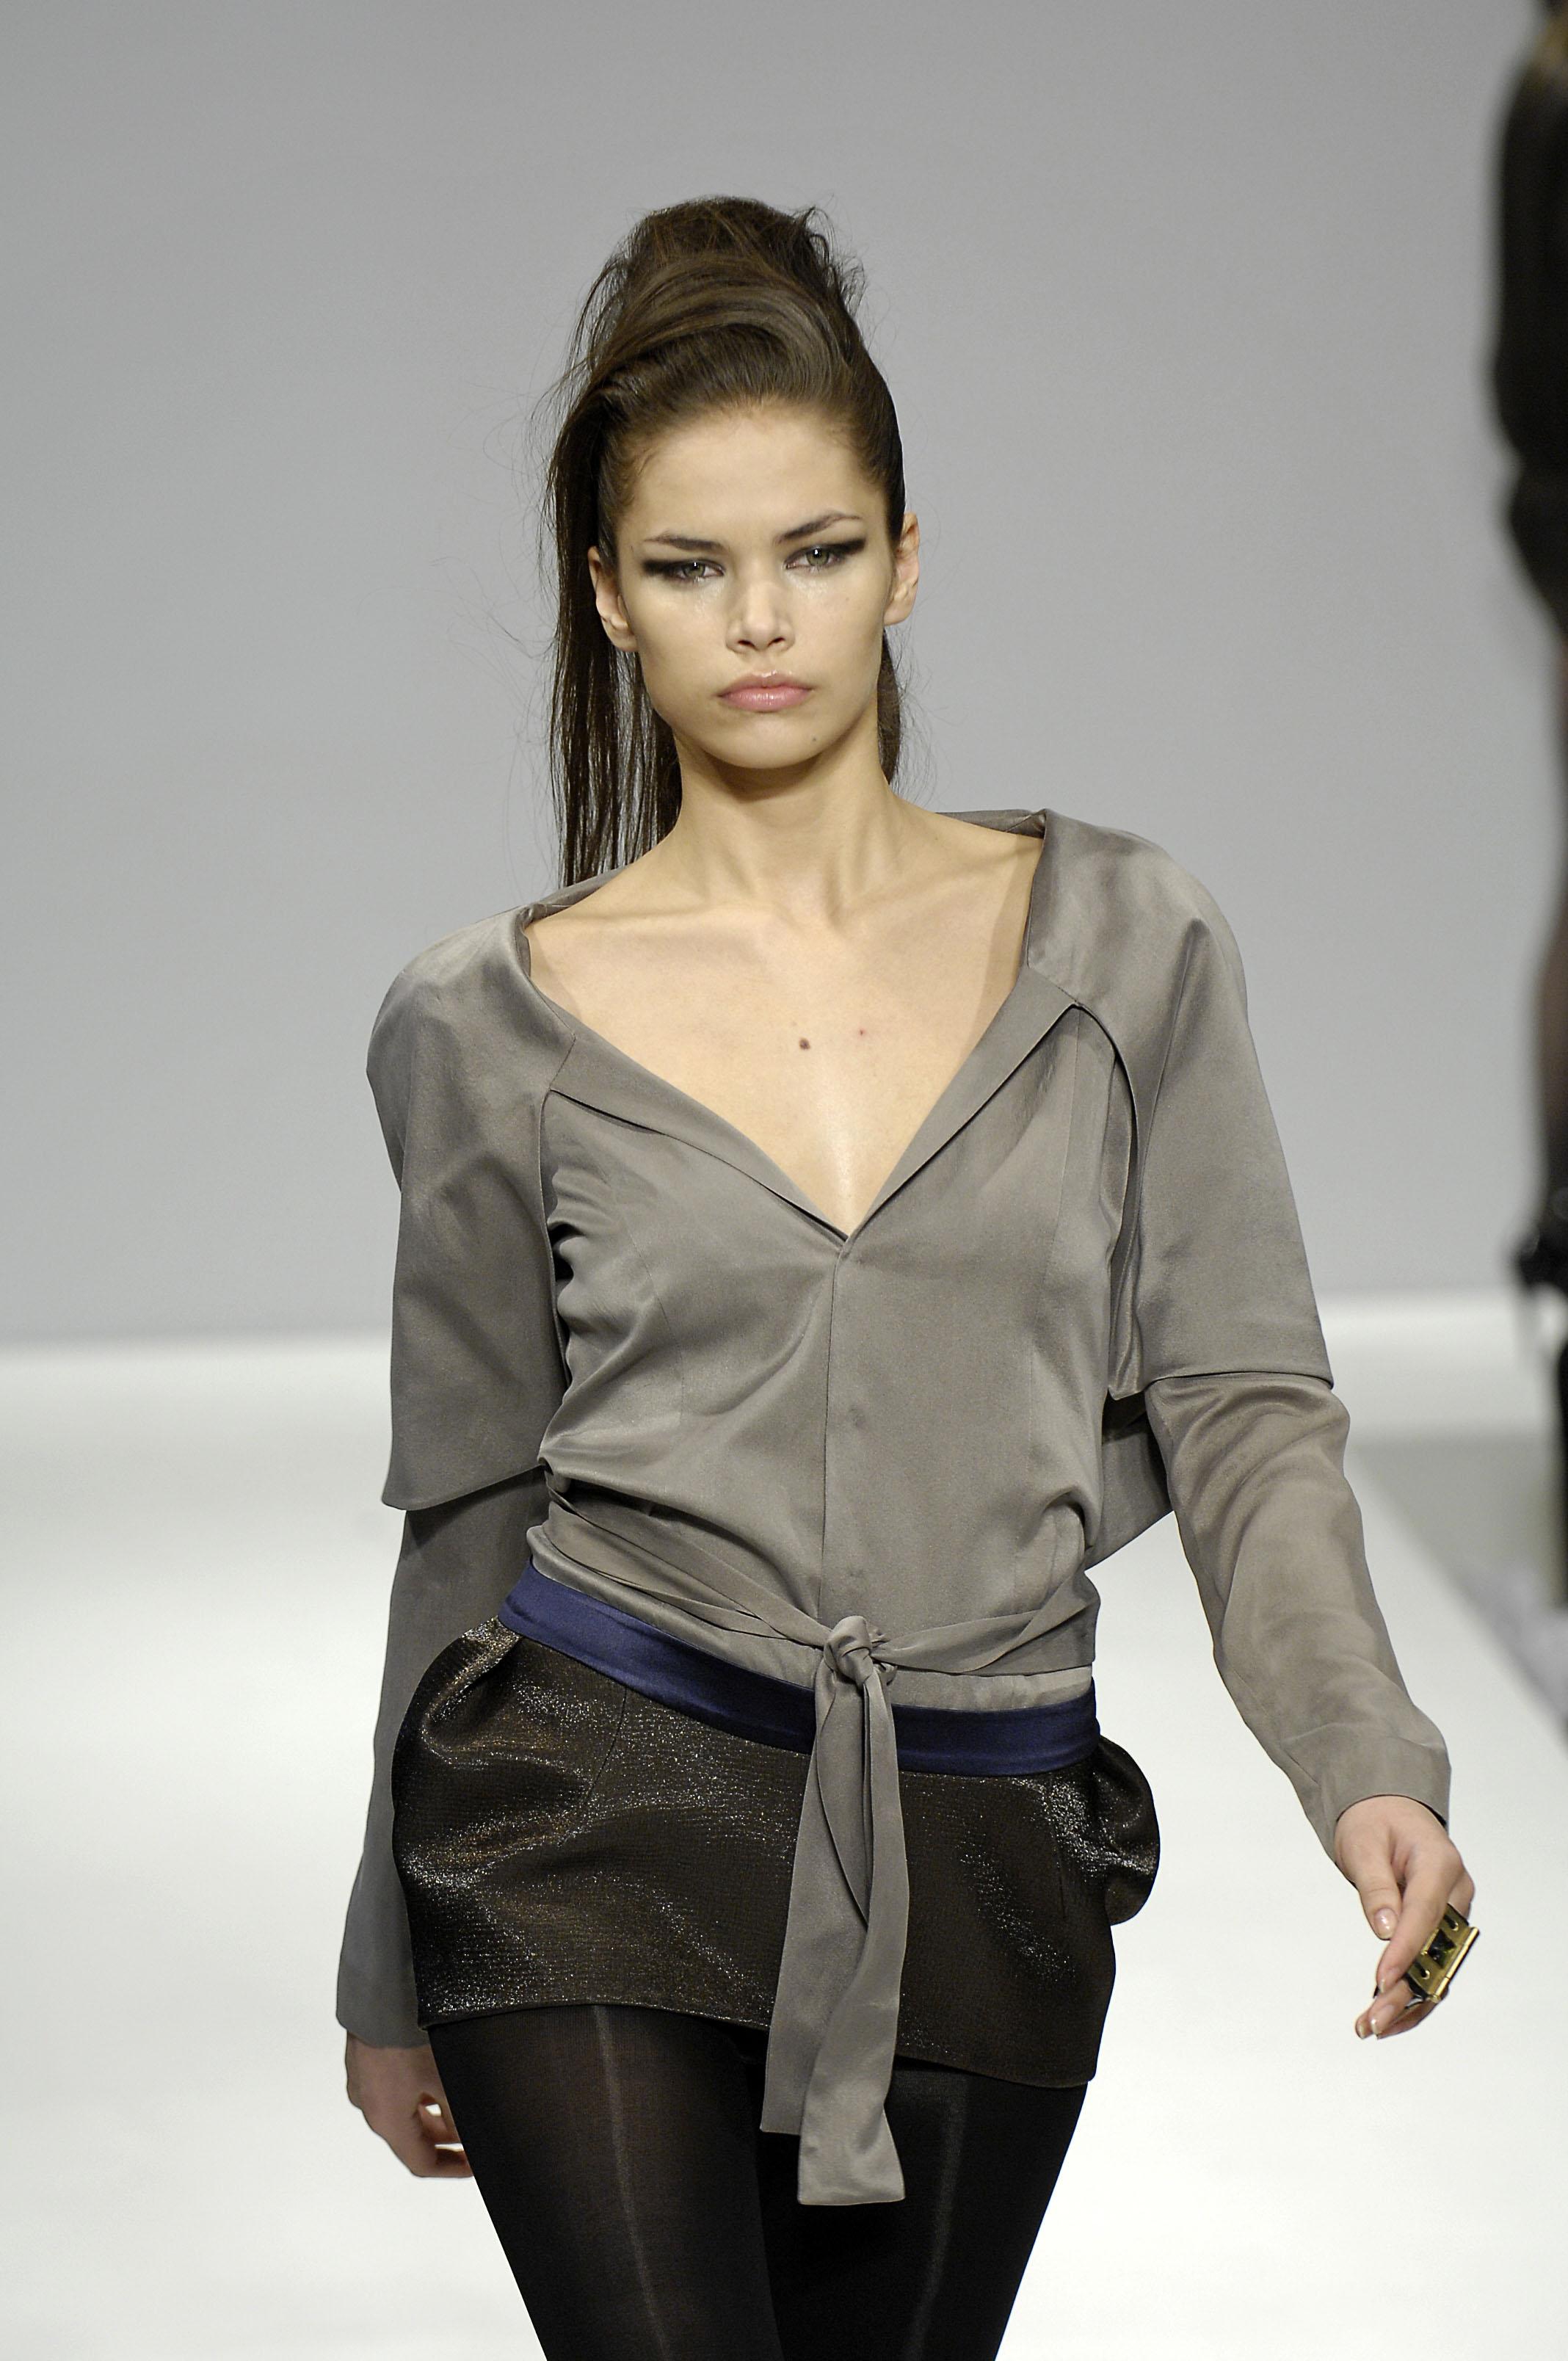 Katya Shchekina RUS 2006